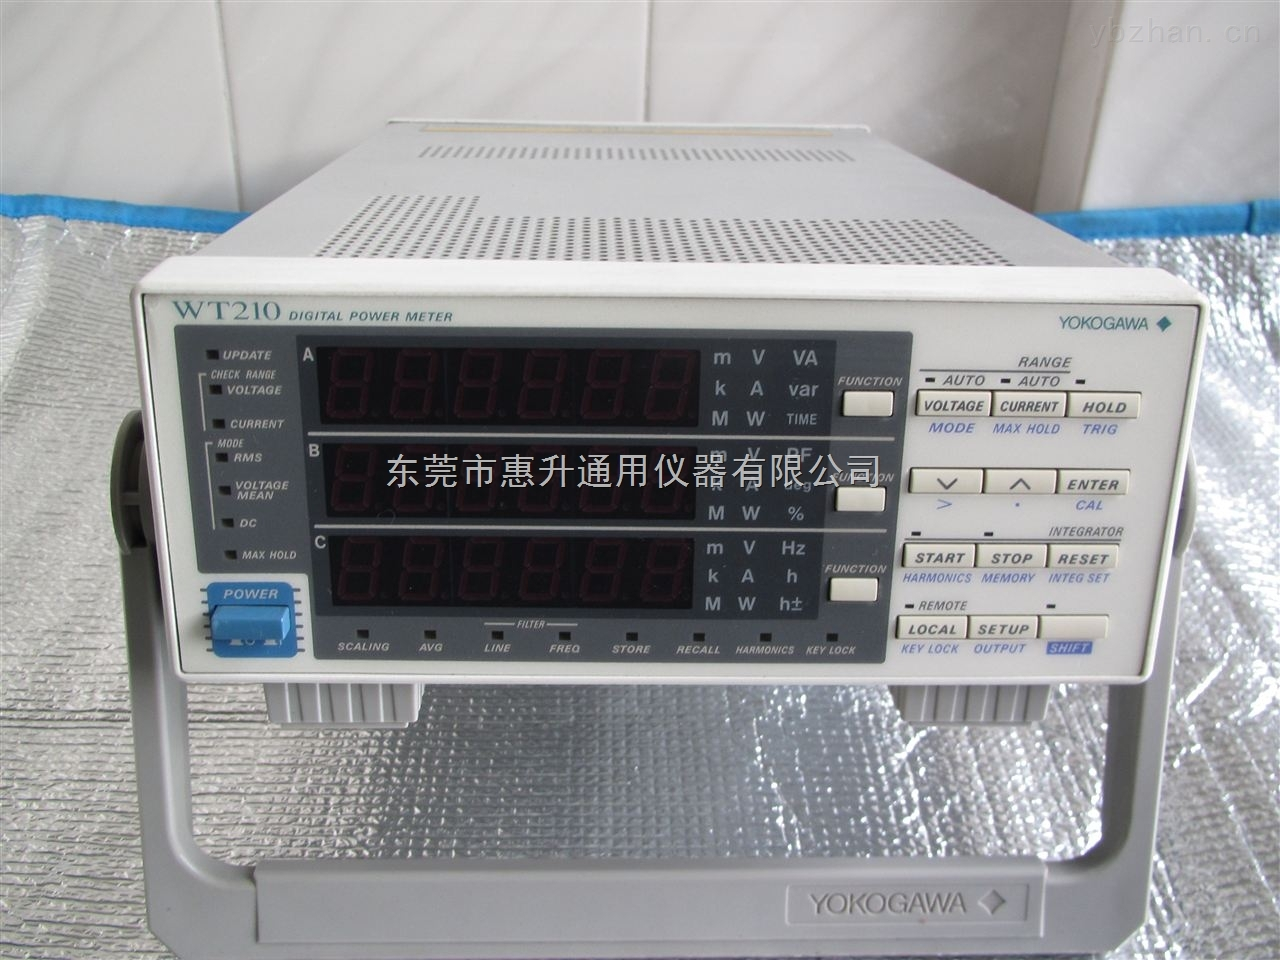 日本横河WT230 WT230价格 WT230批发